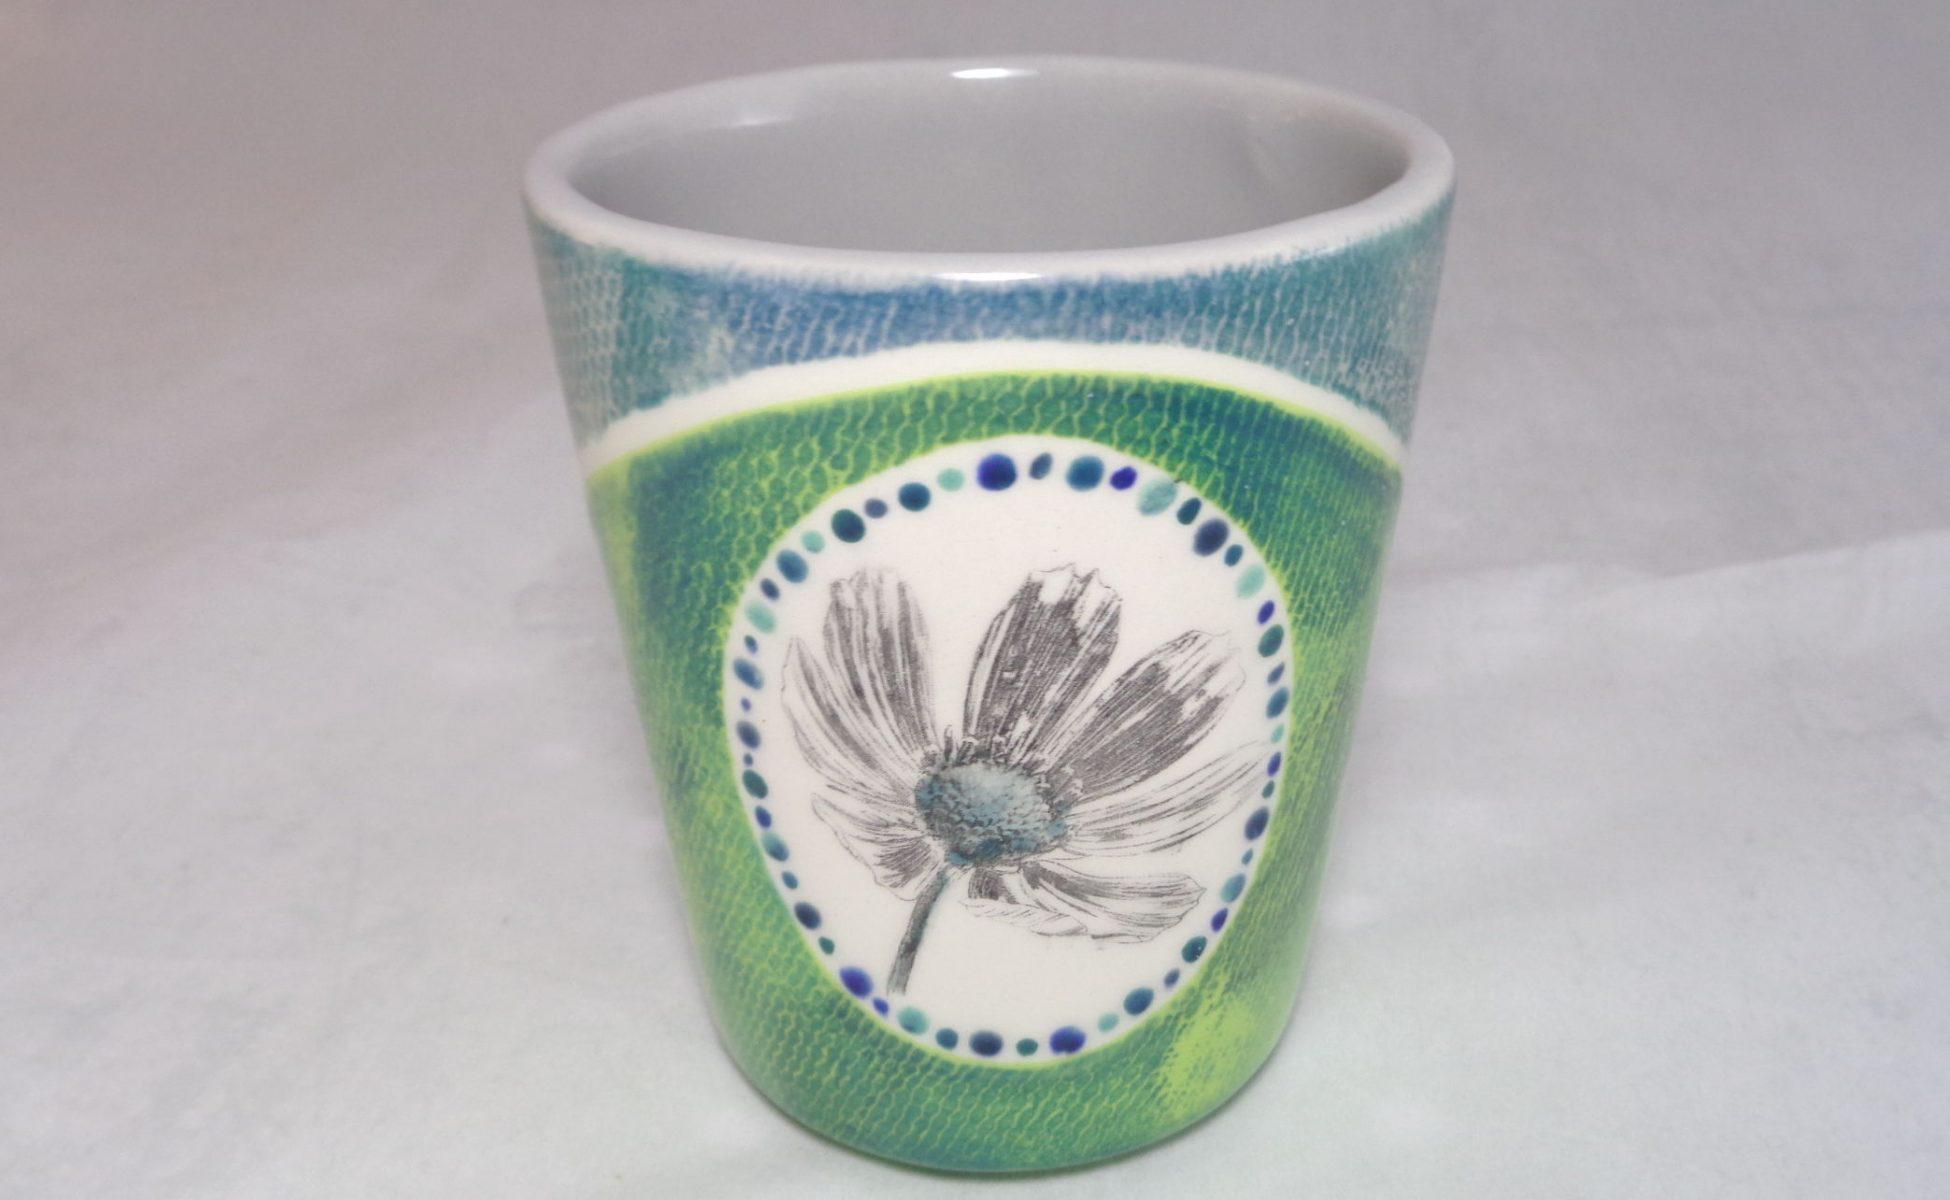 Bemalte Keramik Milchbecher Margerite